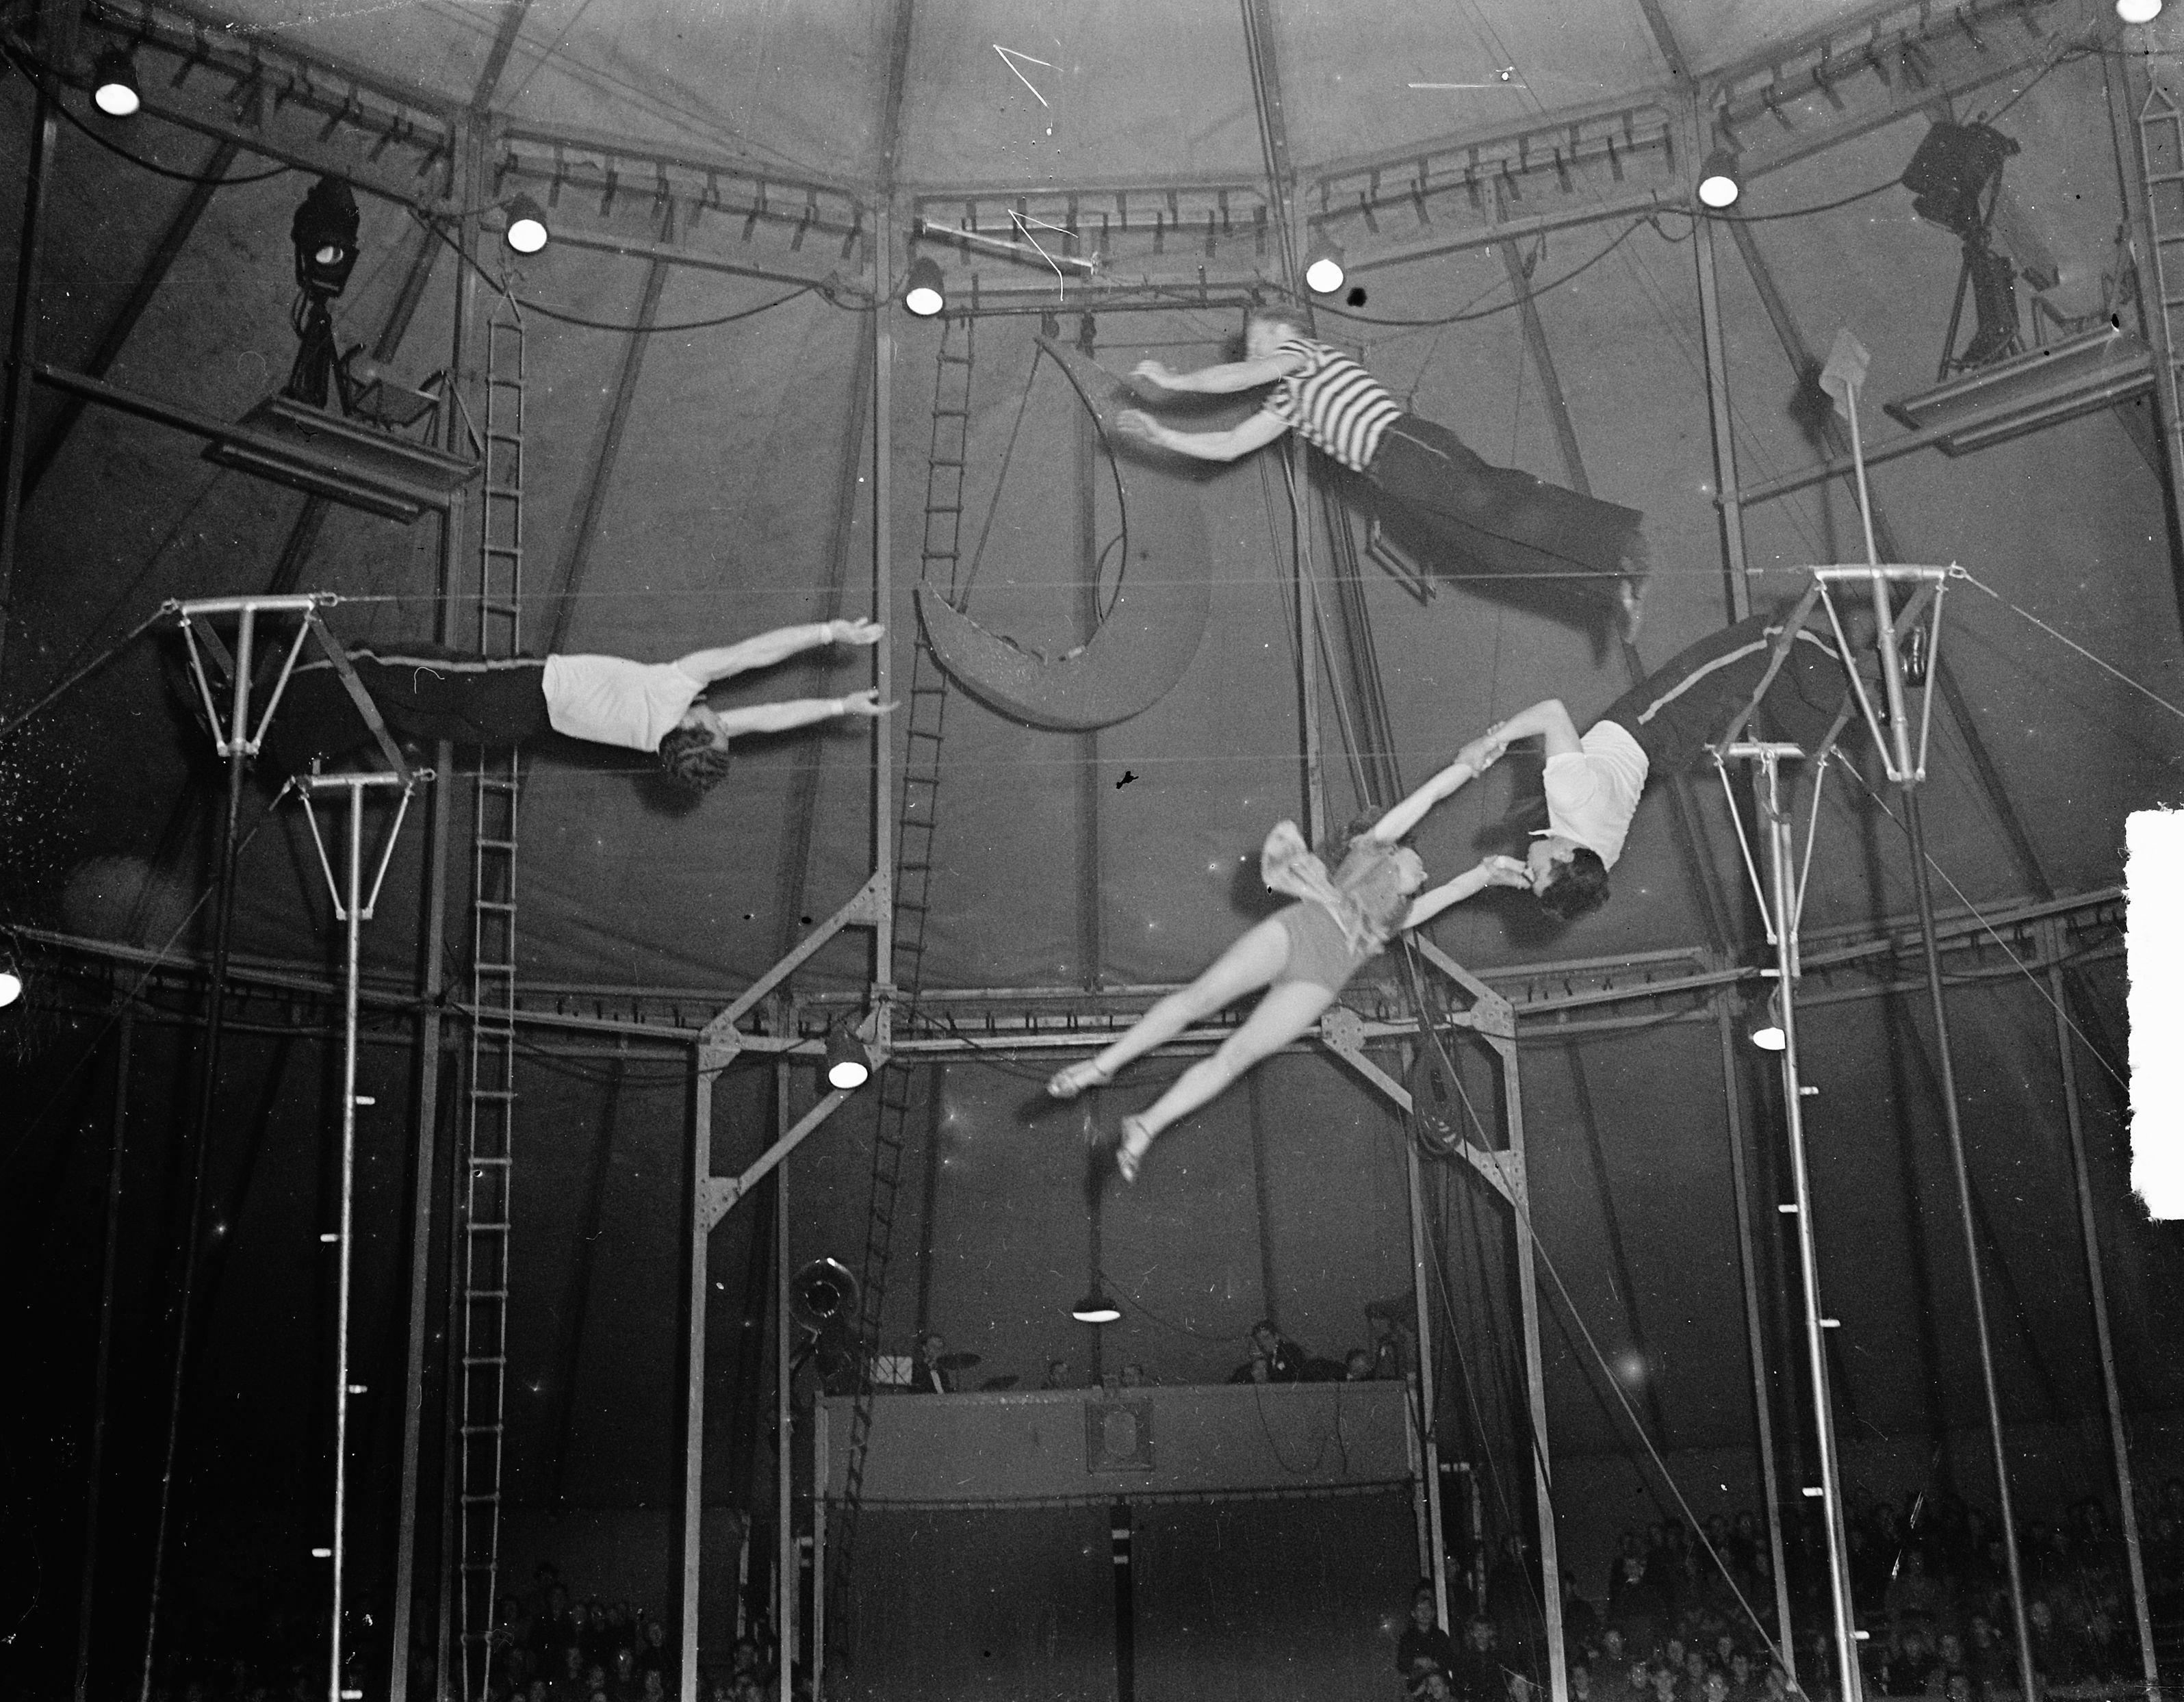 Beschrijving : Circus Mikkenie. Trampoline. The 4 Airways Datum : 28 oktober 1948 Trefwoorden : acrobatiek, circussen, trampolines Persoonsnaam : Circus Mikkenie